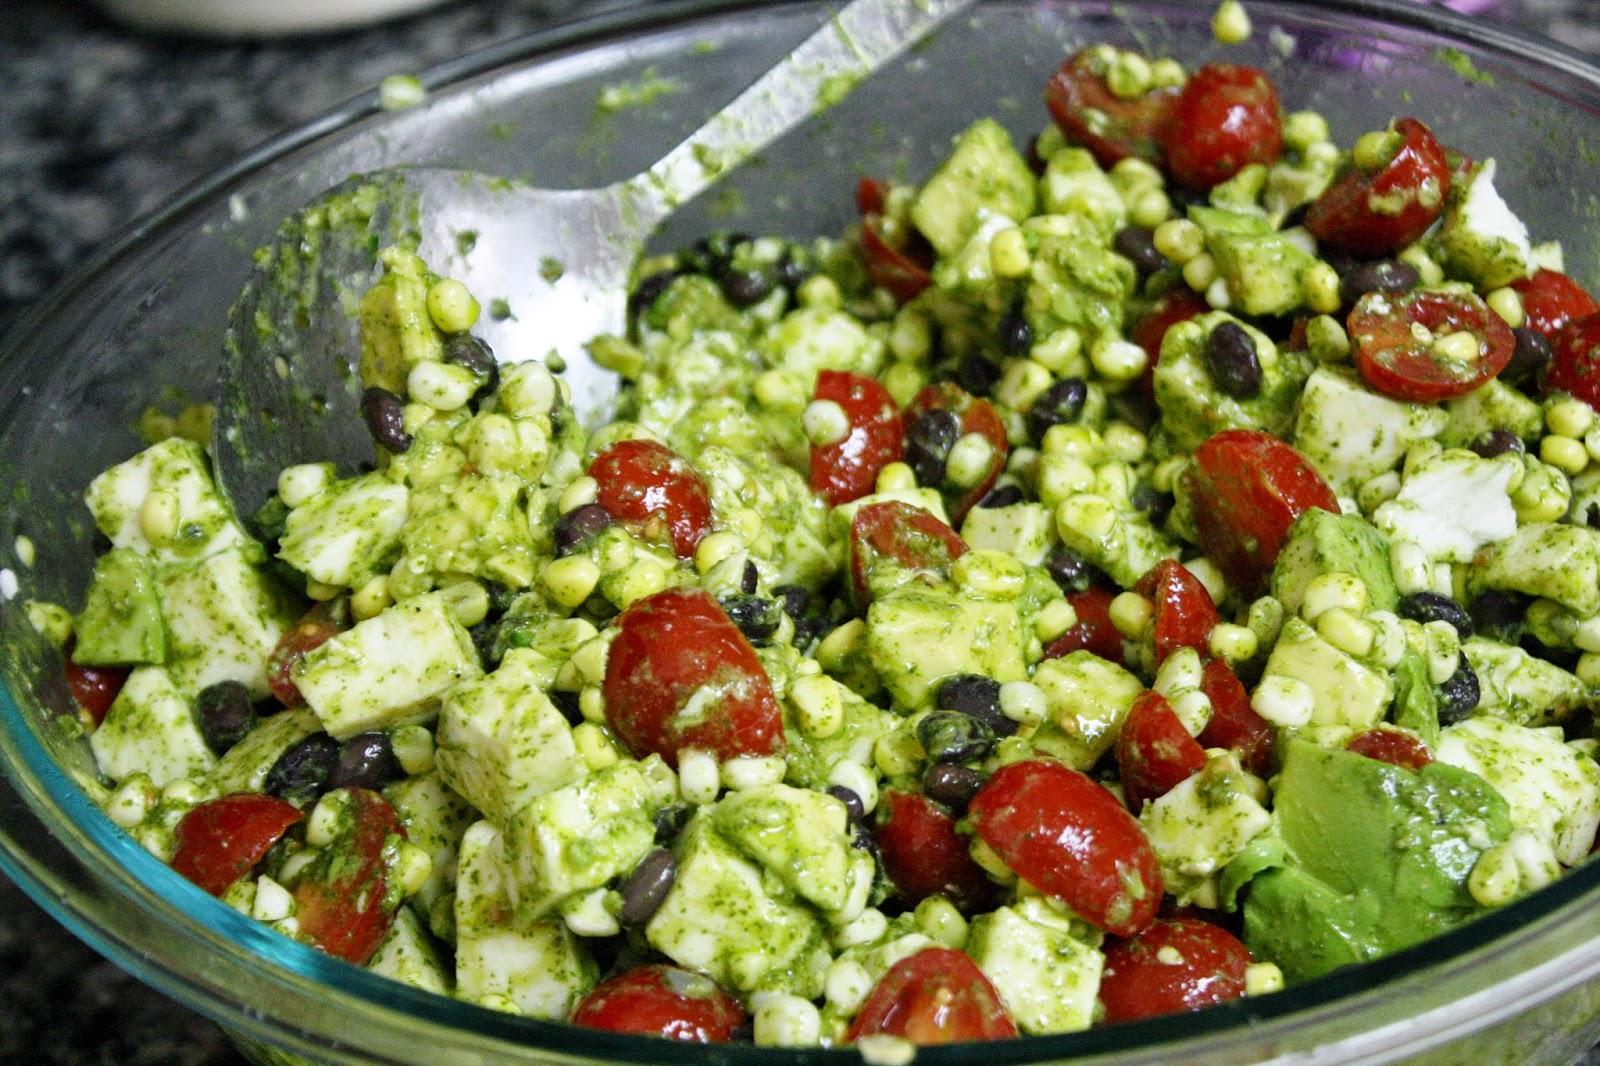 http://eatprayjuice.blogspot.com/2014/06/corn-tomato-and-avocado-salad-with.html